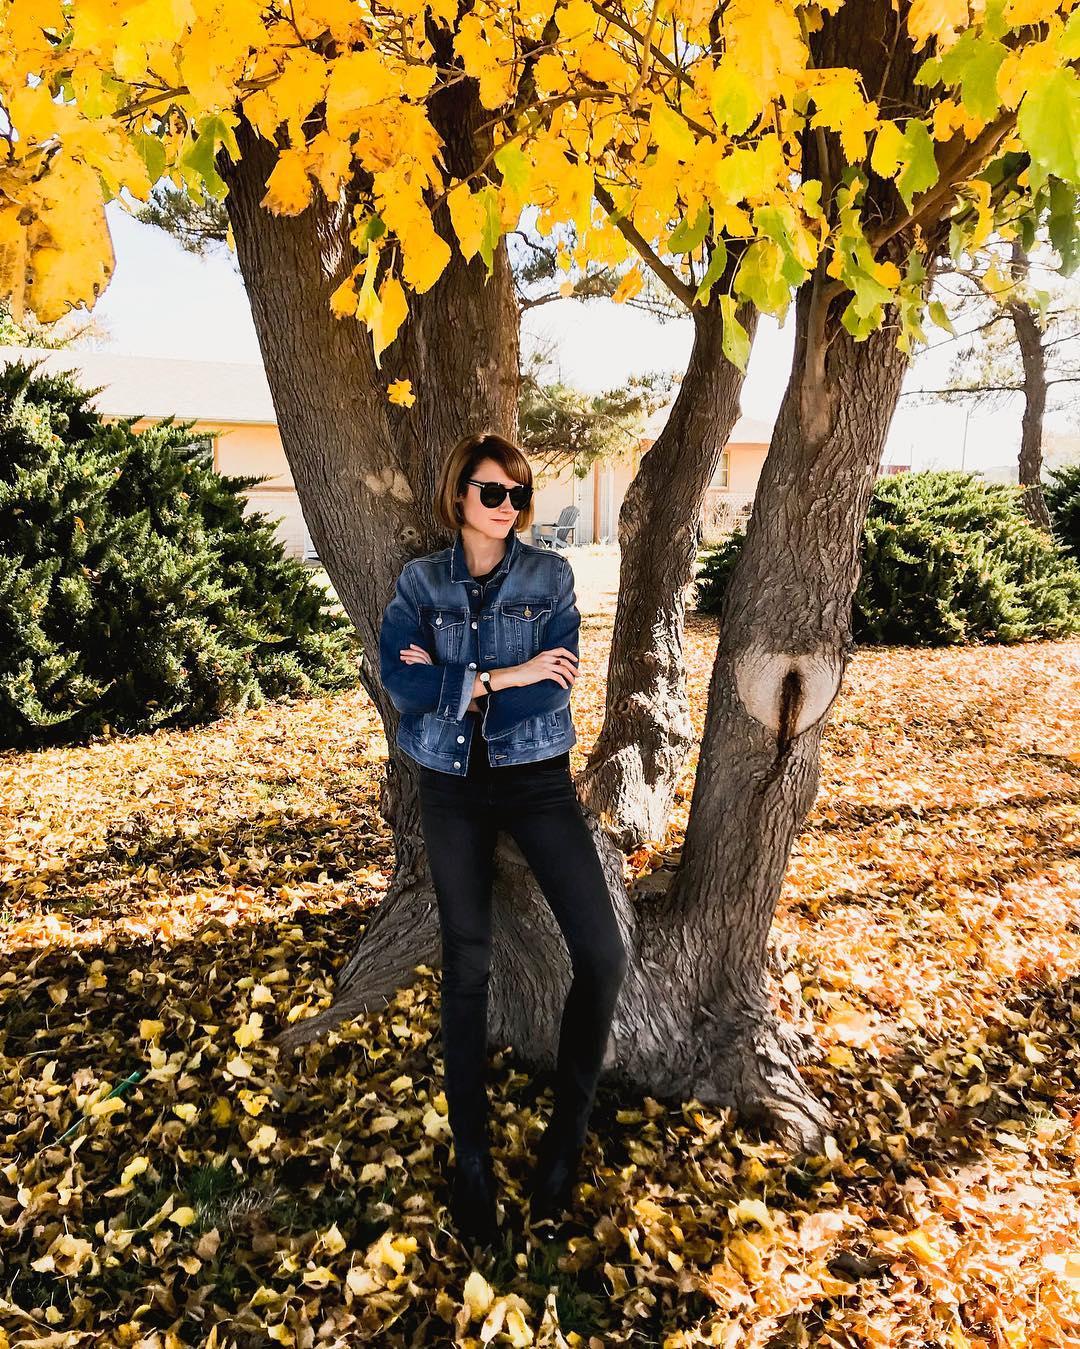 oversized denim jacket and skinny jeans